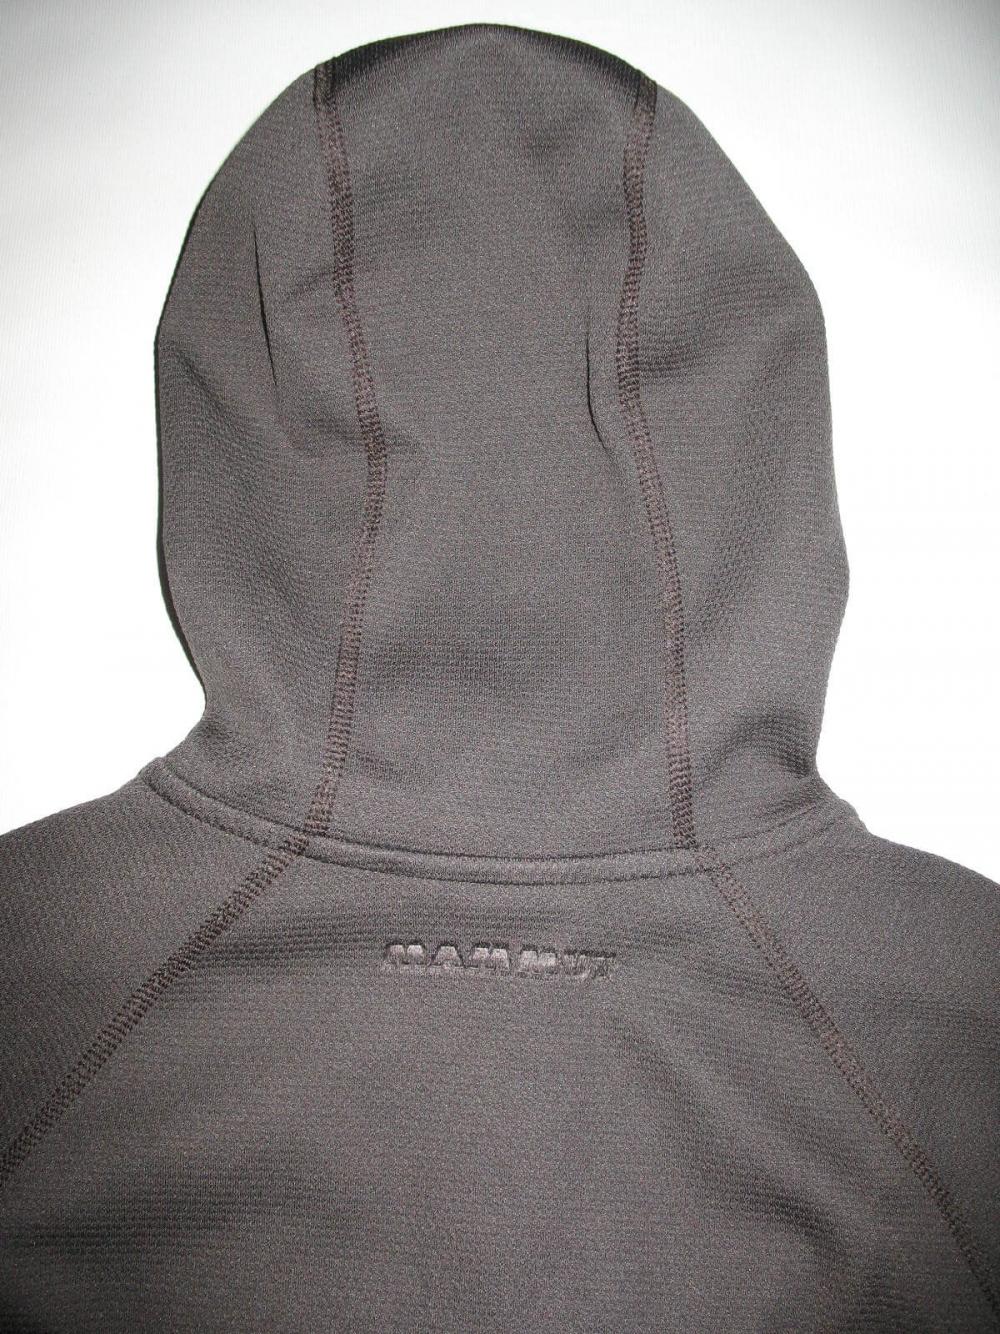 Куртка MAMMUT fleece hoodie jacket lady (размер M) - 7